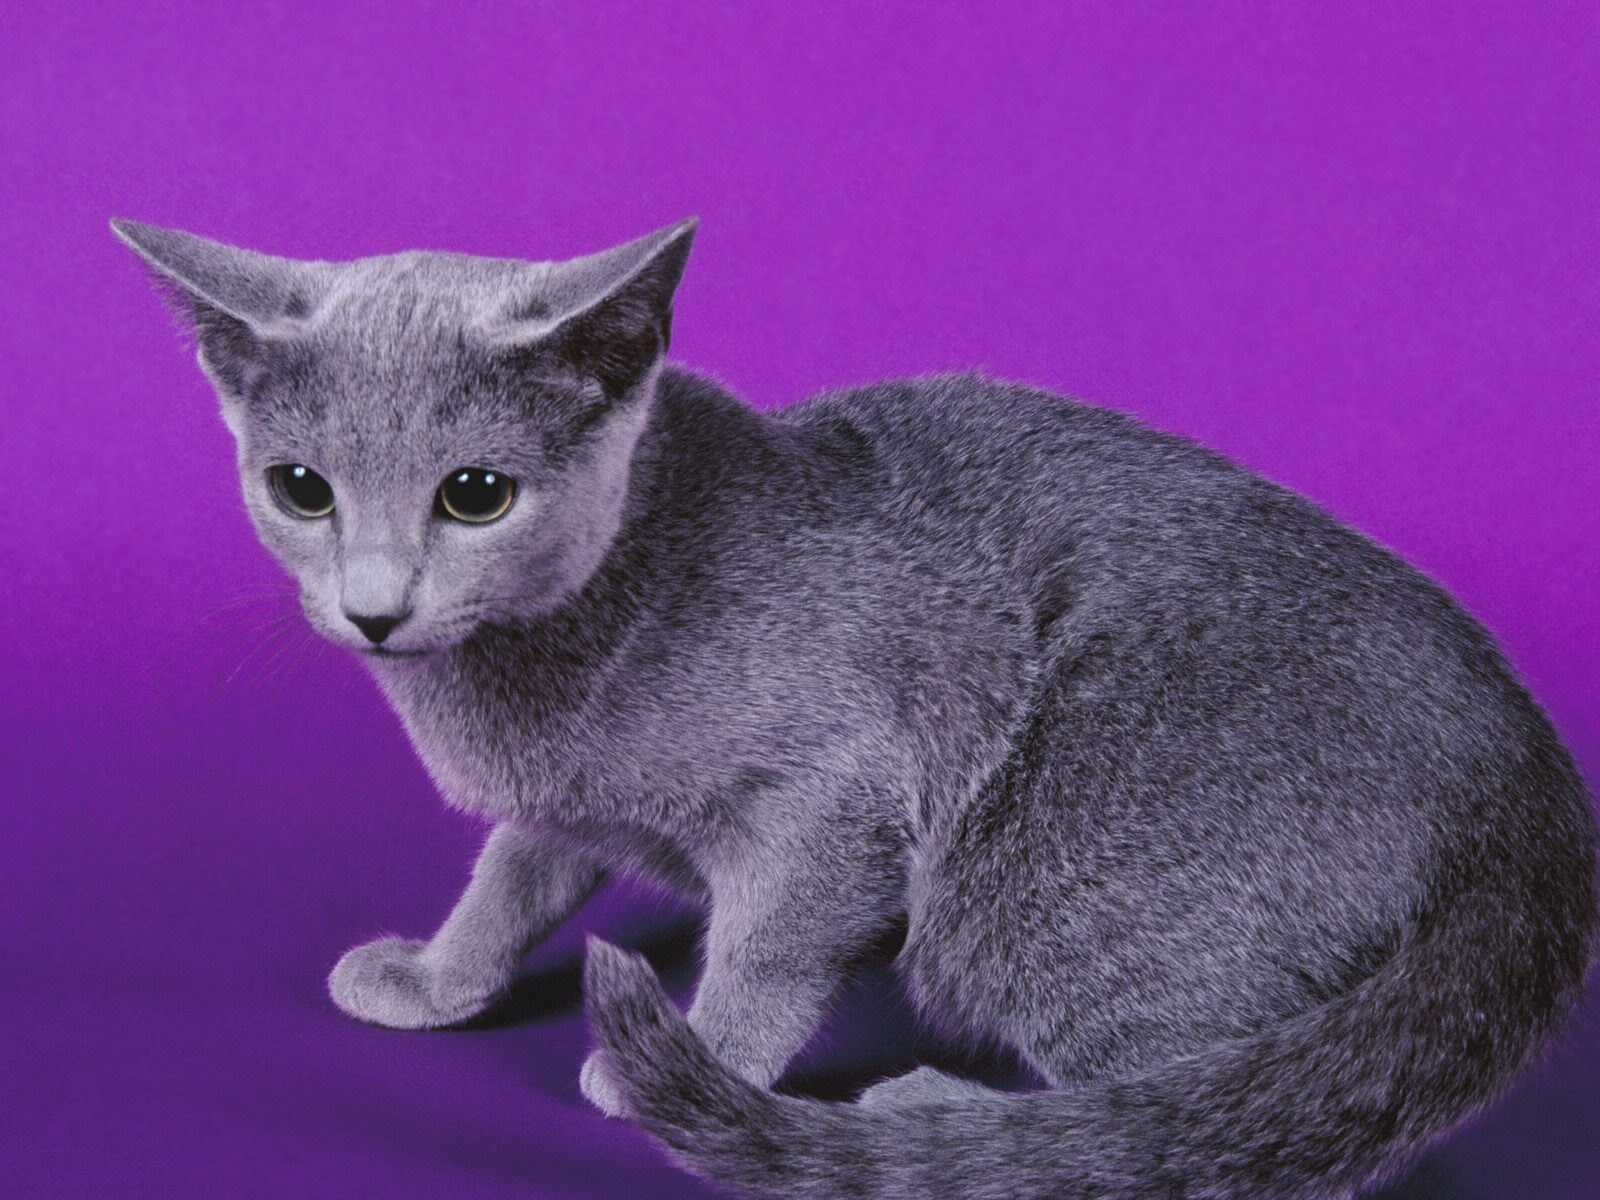 Os X Wallpapers Hd Gatos Cats Mascotas Wallpapers Fondos De Pantalla Hd